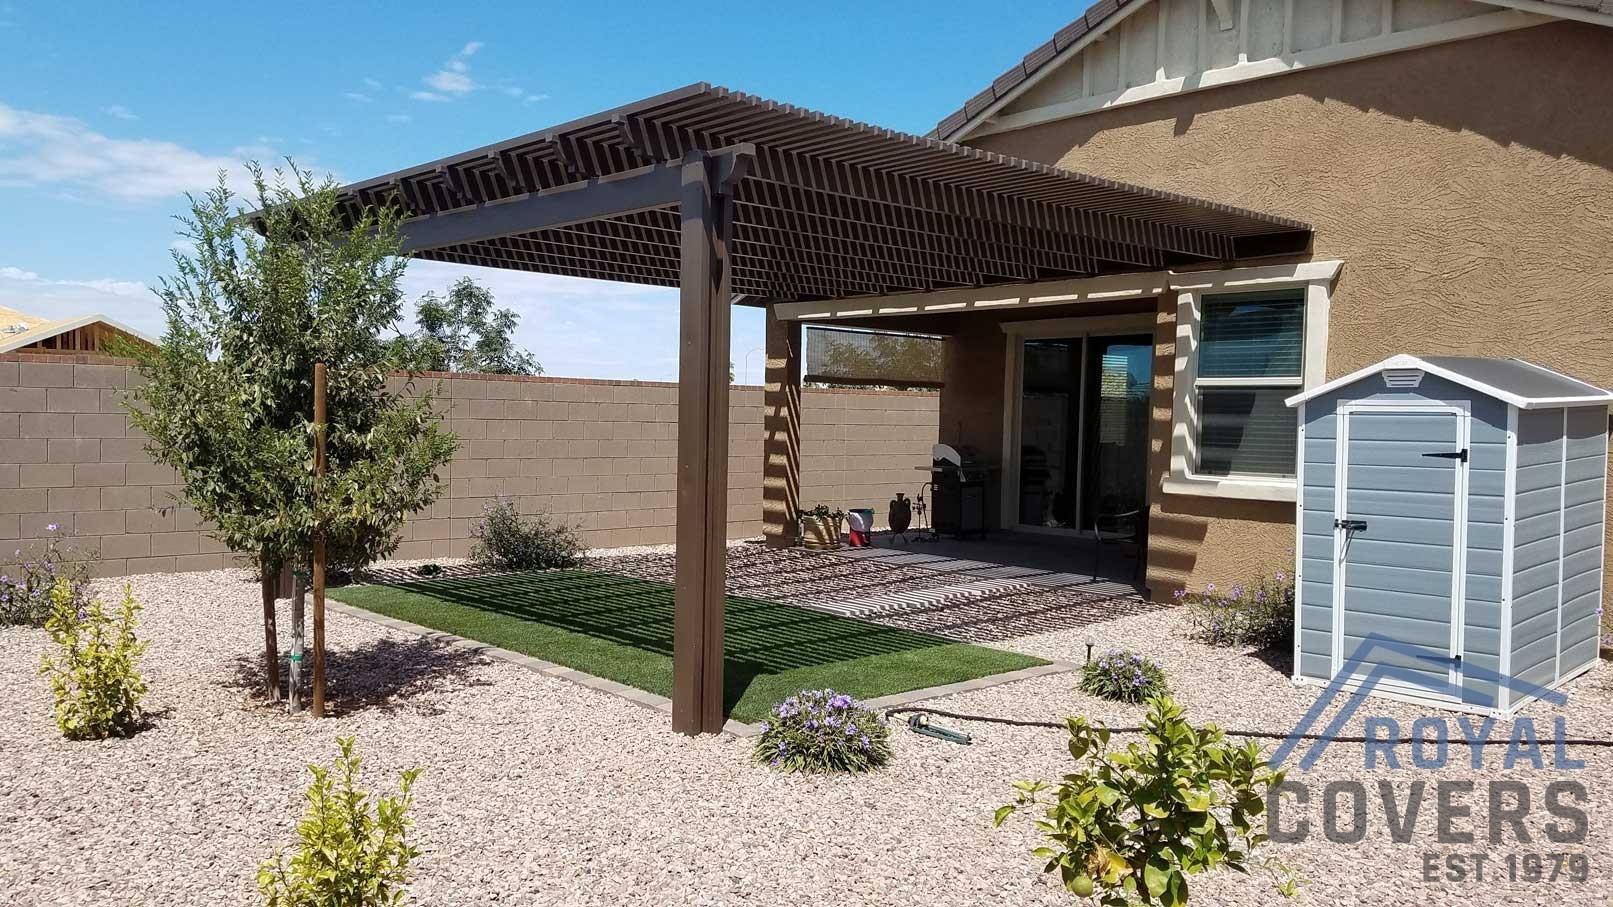 backyard patio extension royal covers